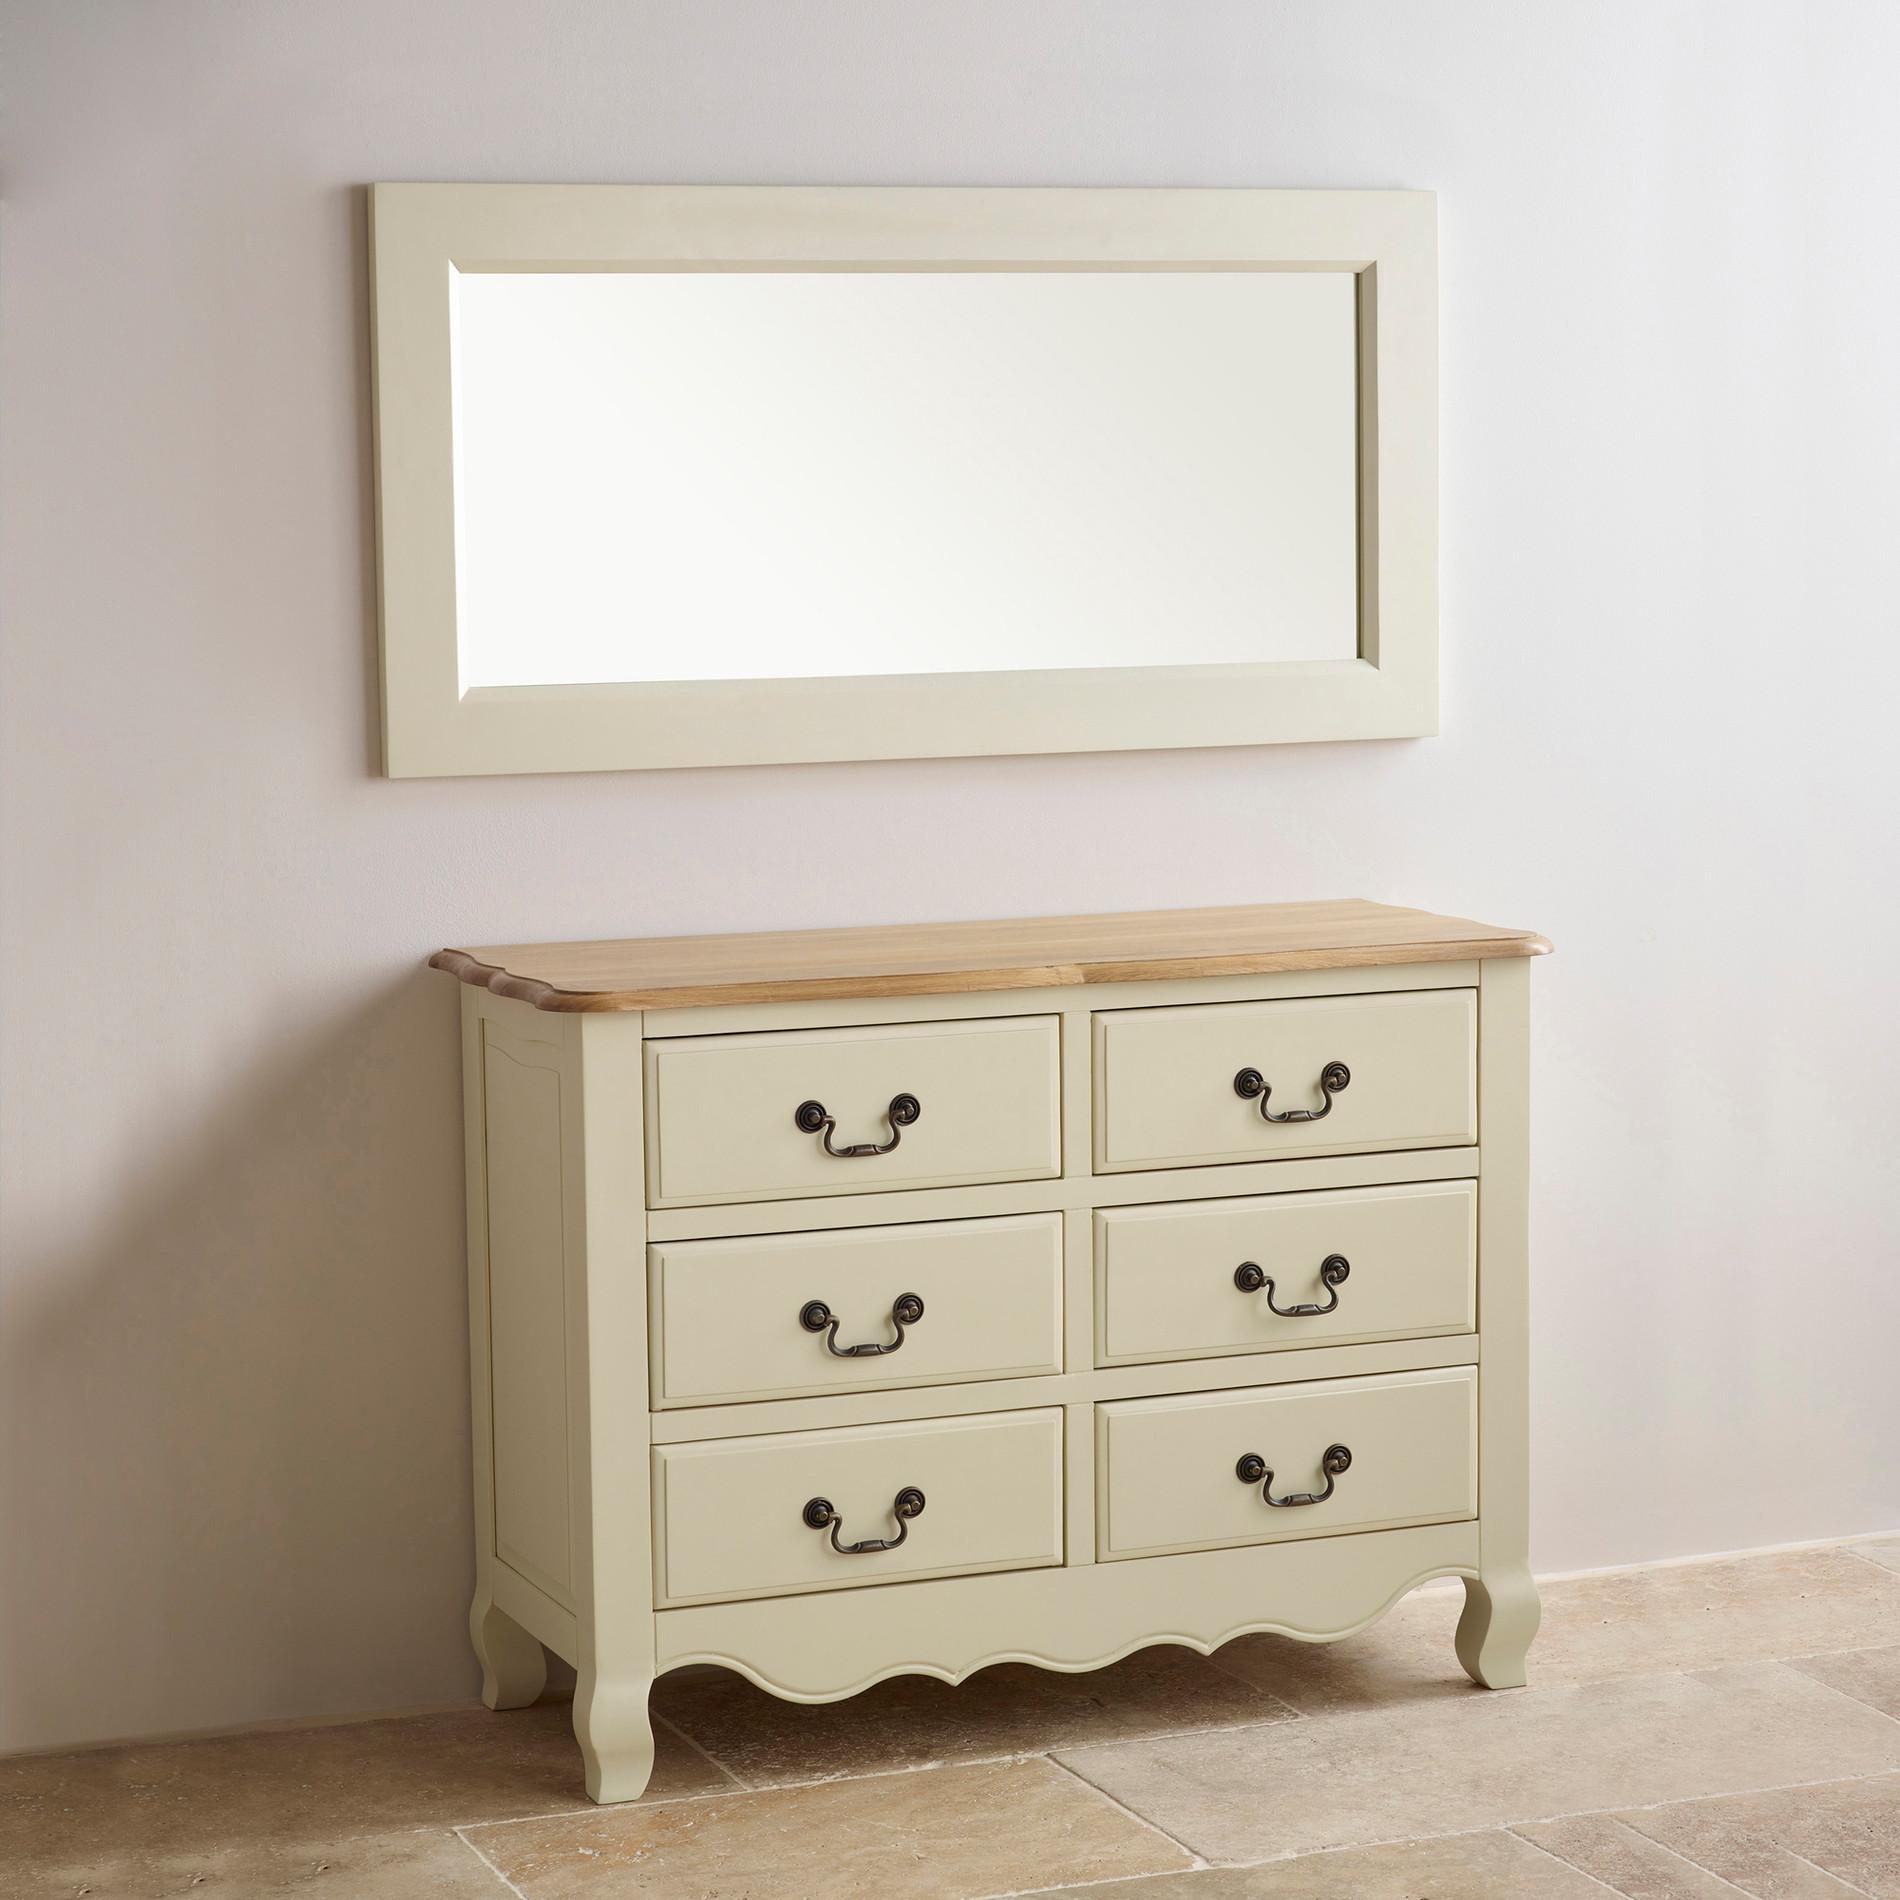 Bella painted wall mirror in brushed oak oak furniture land amipublicfo Images